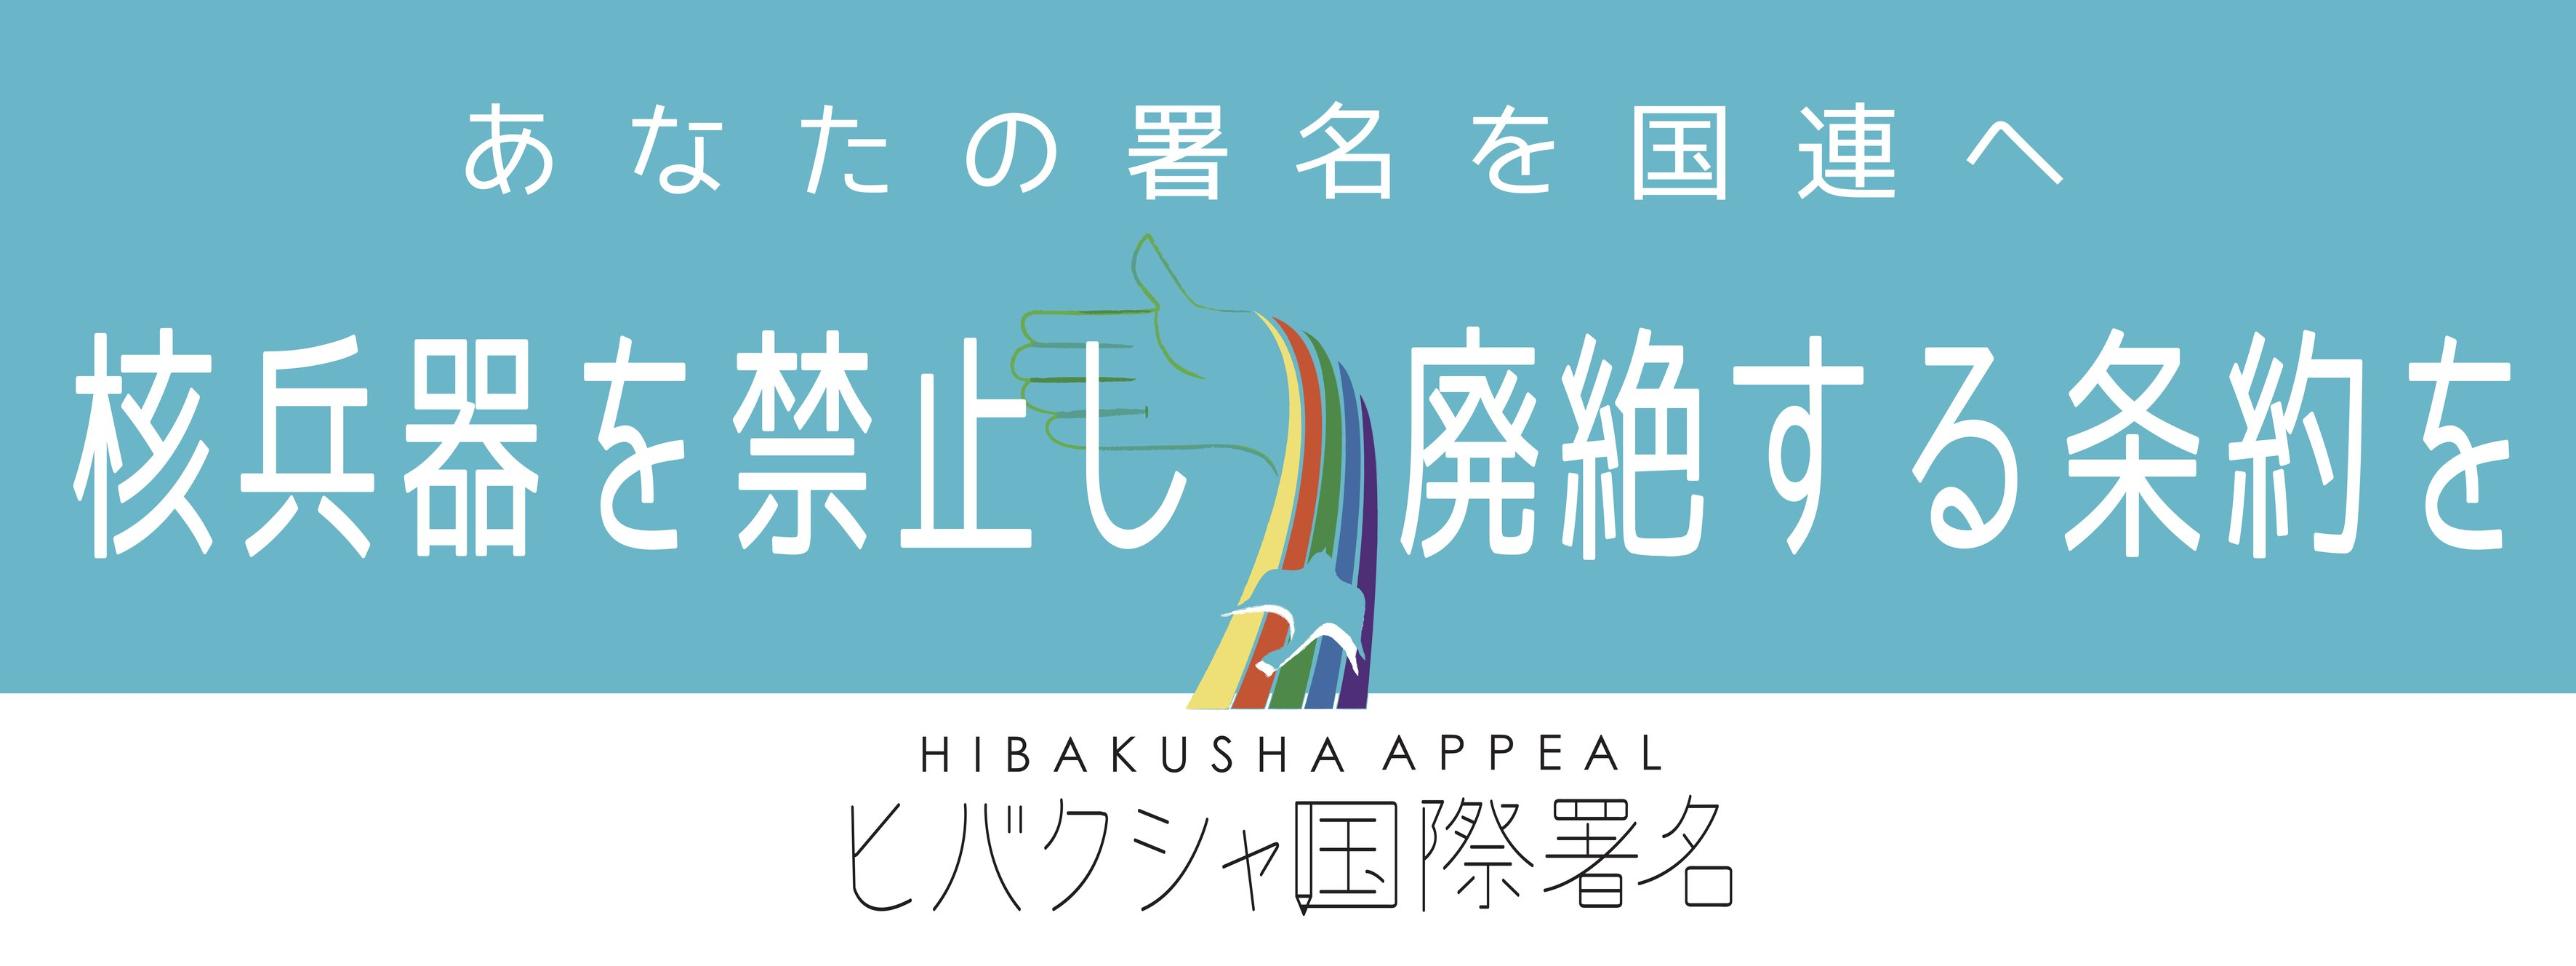 hibakusha appeal